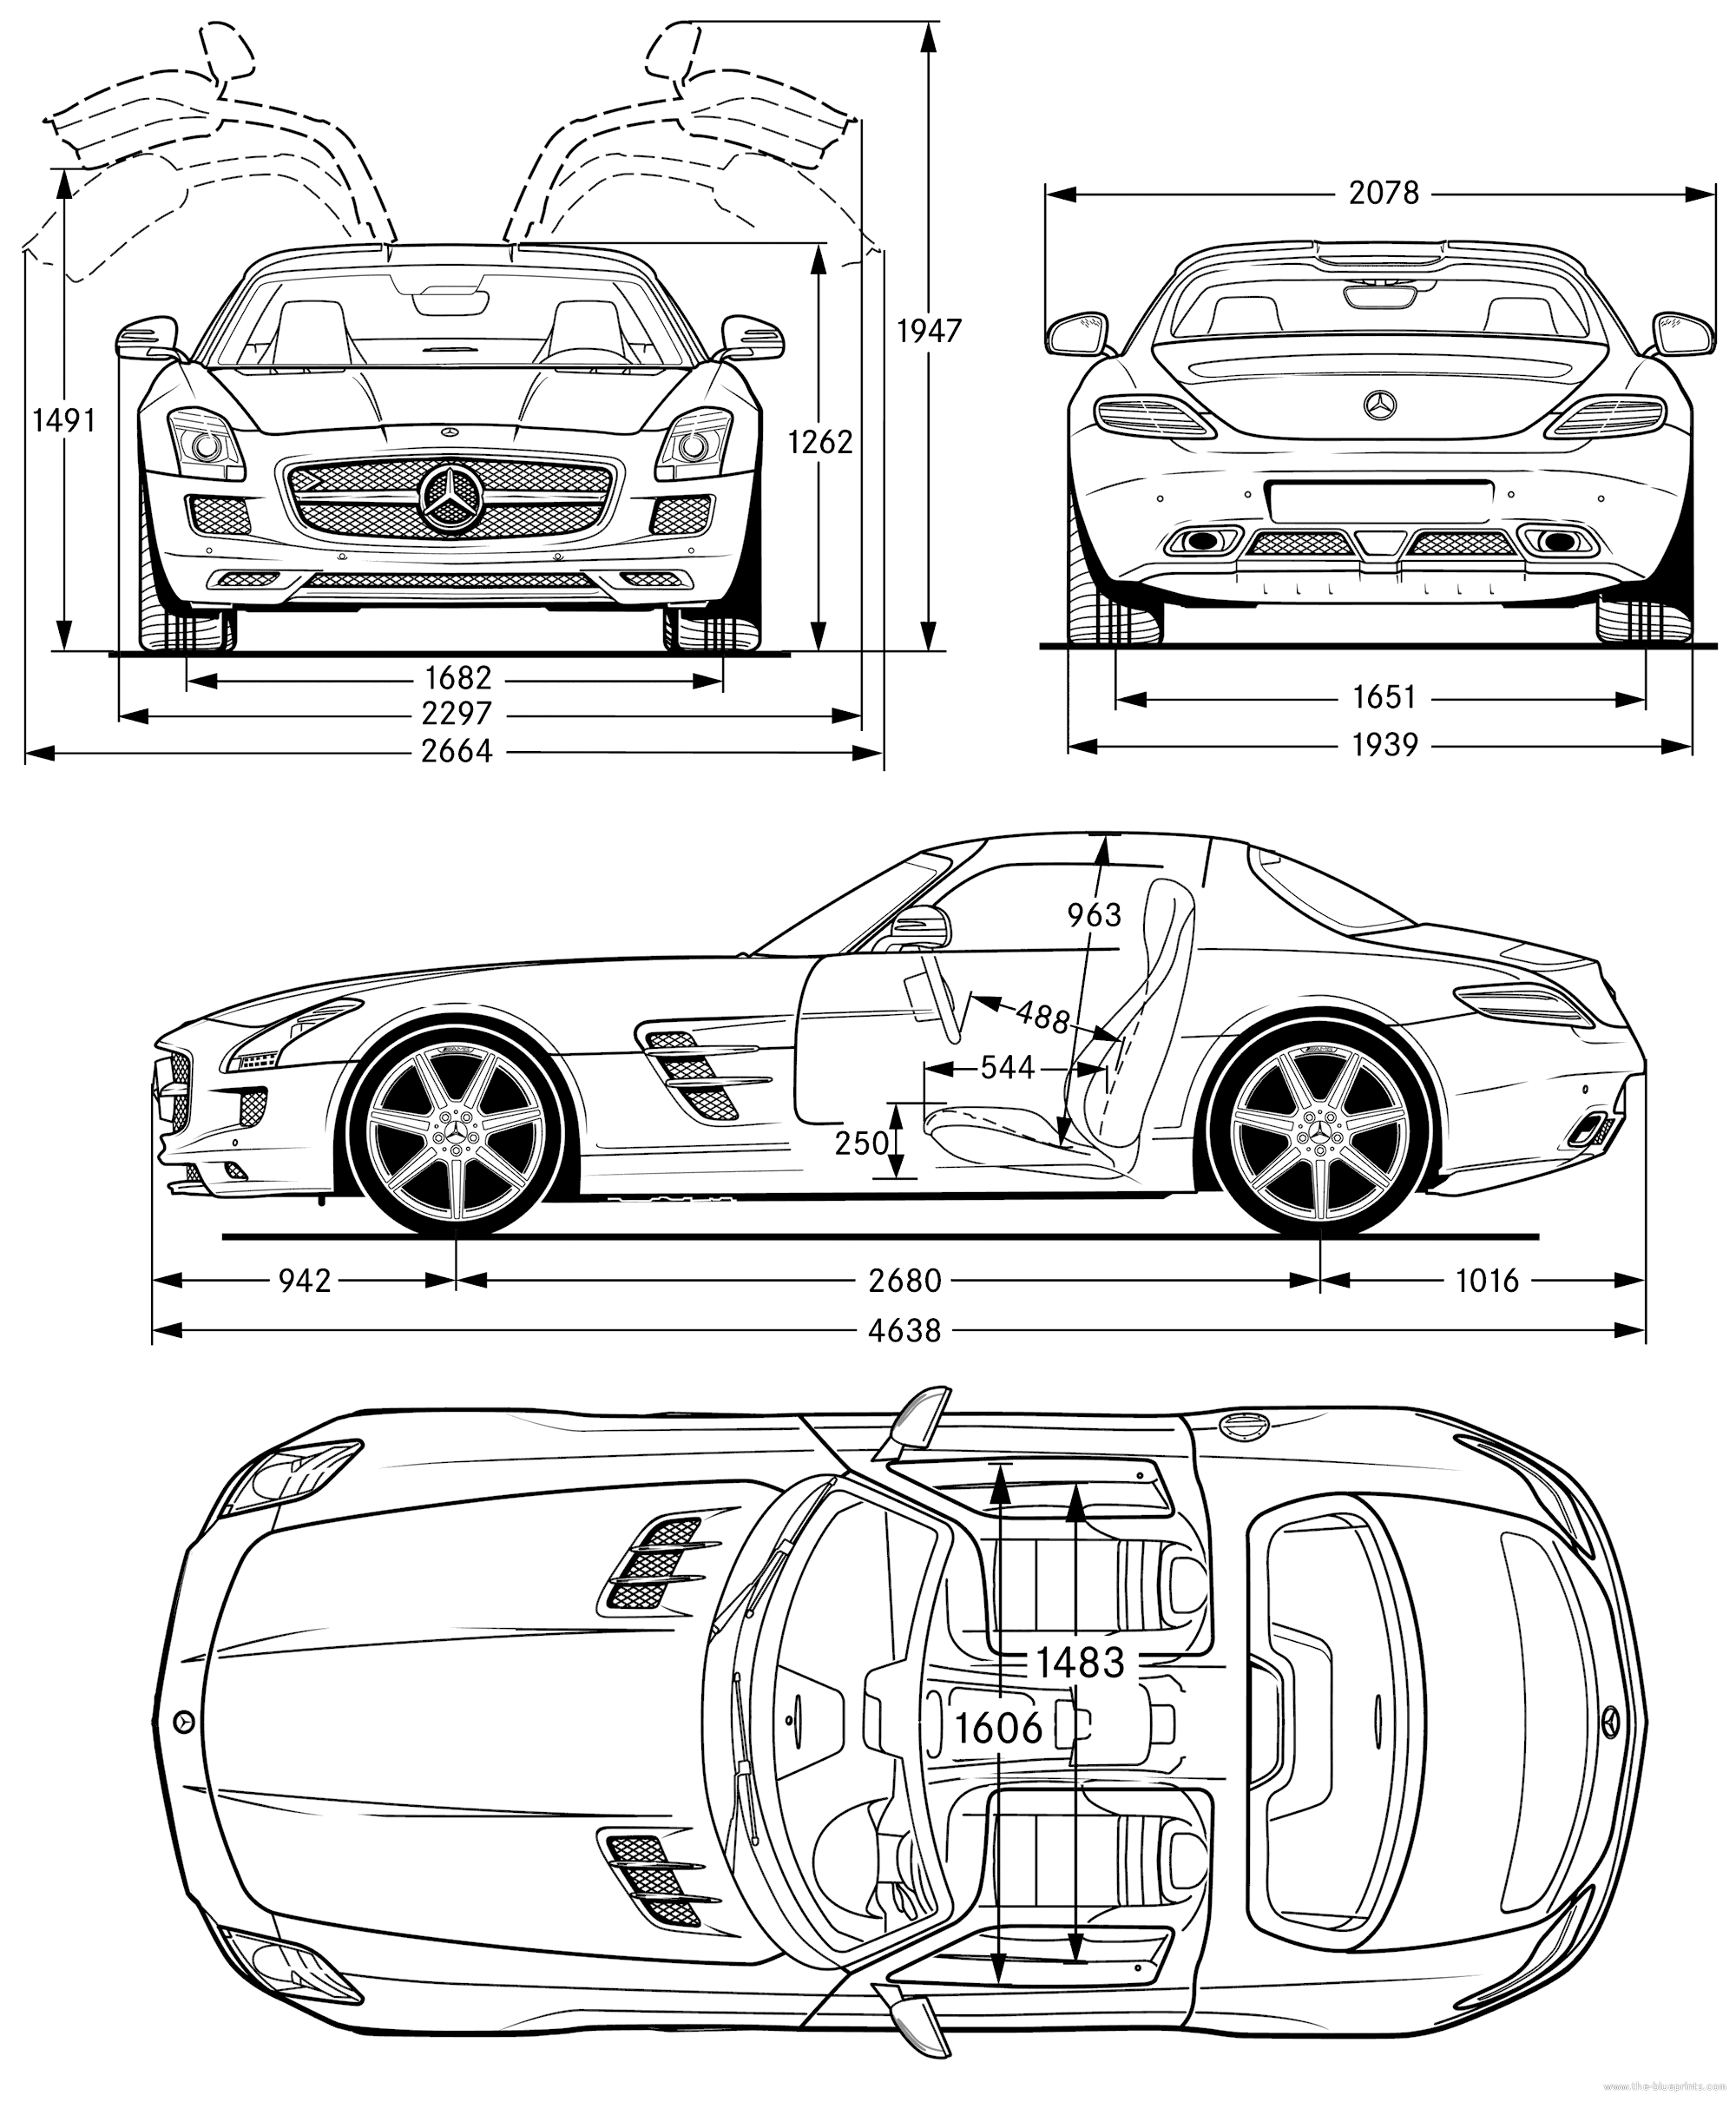 Mercedes-Benz-AMG-SLS-2011-The-Blueprints.com | Vehicles | Pinterest ...